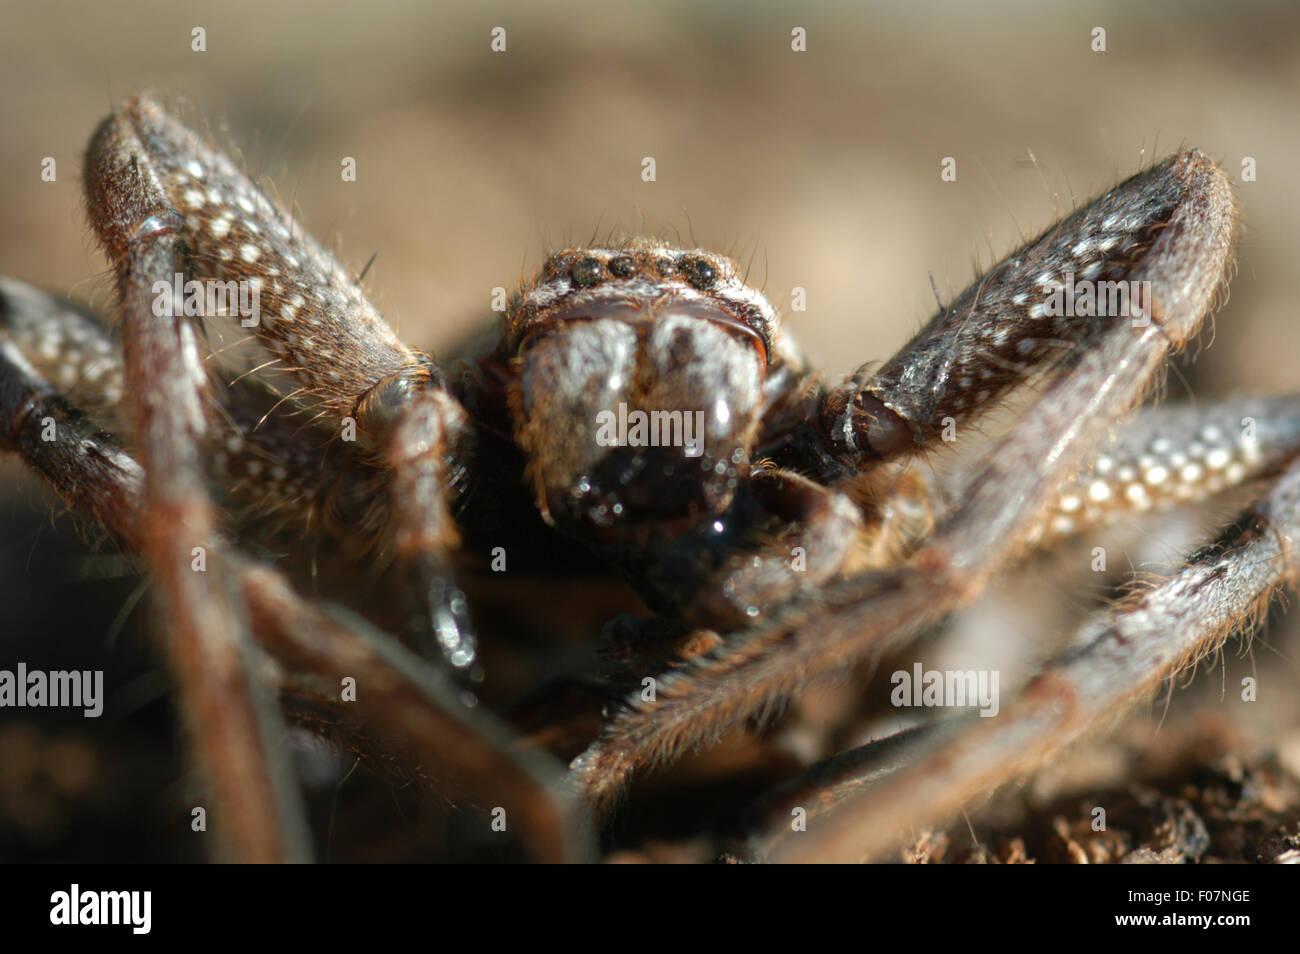 DETAILED SHOT OF SPIDER (ISOPODA SP.) - Stock Image